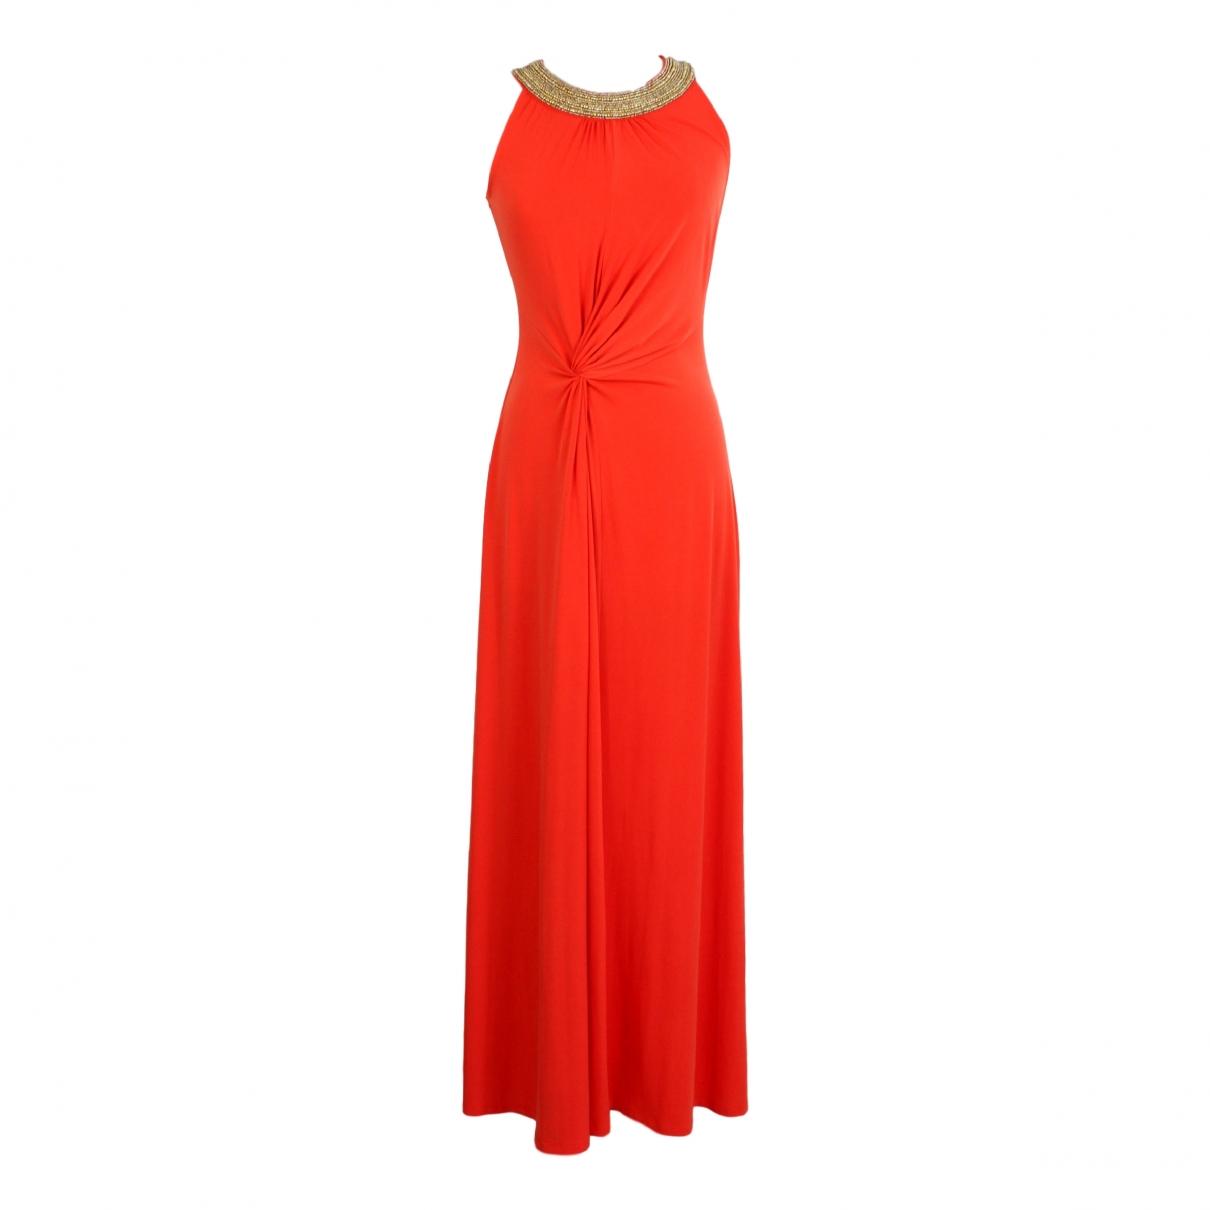 Michael Kors \N Orange dress for Women 42 IT